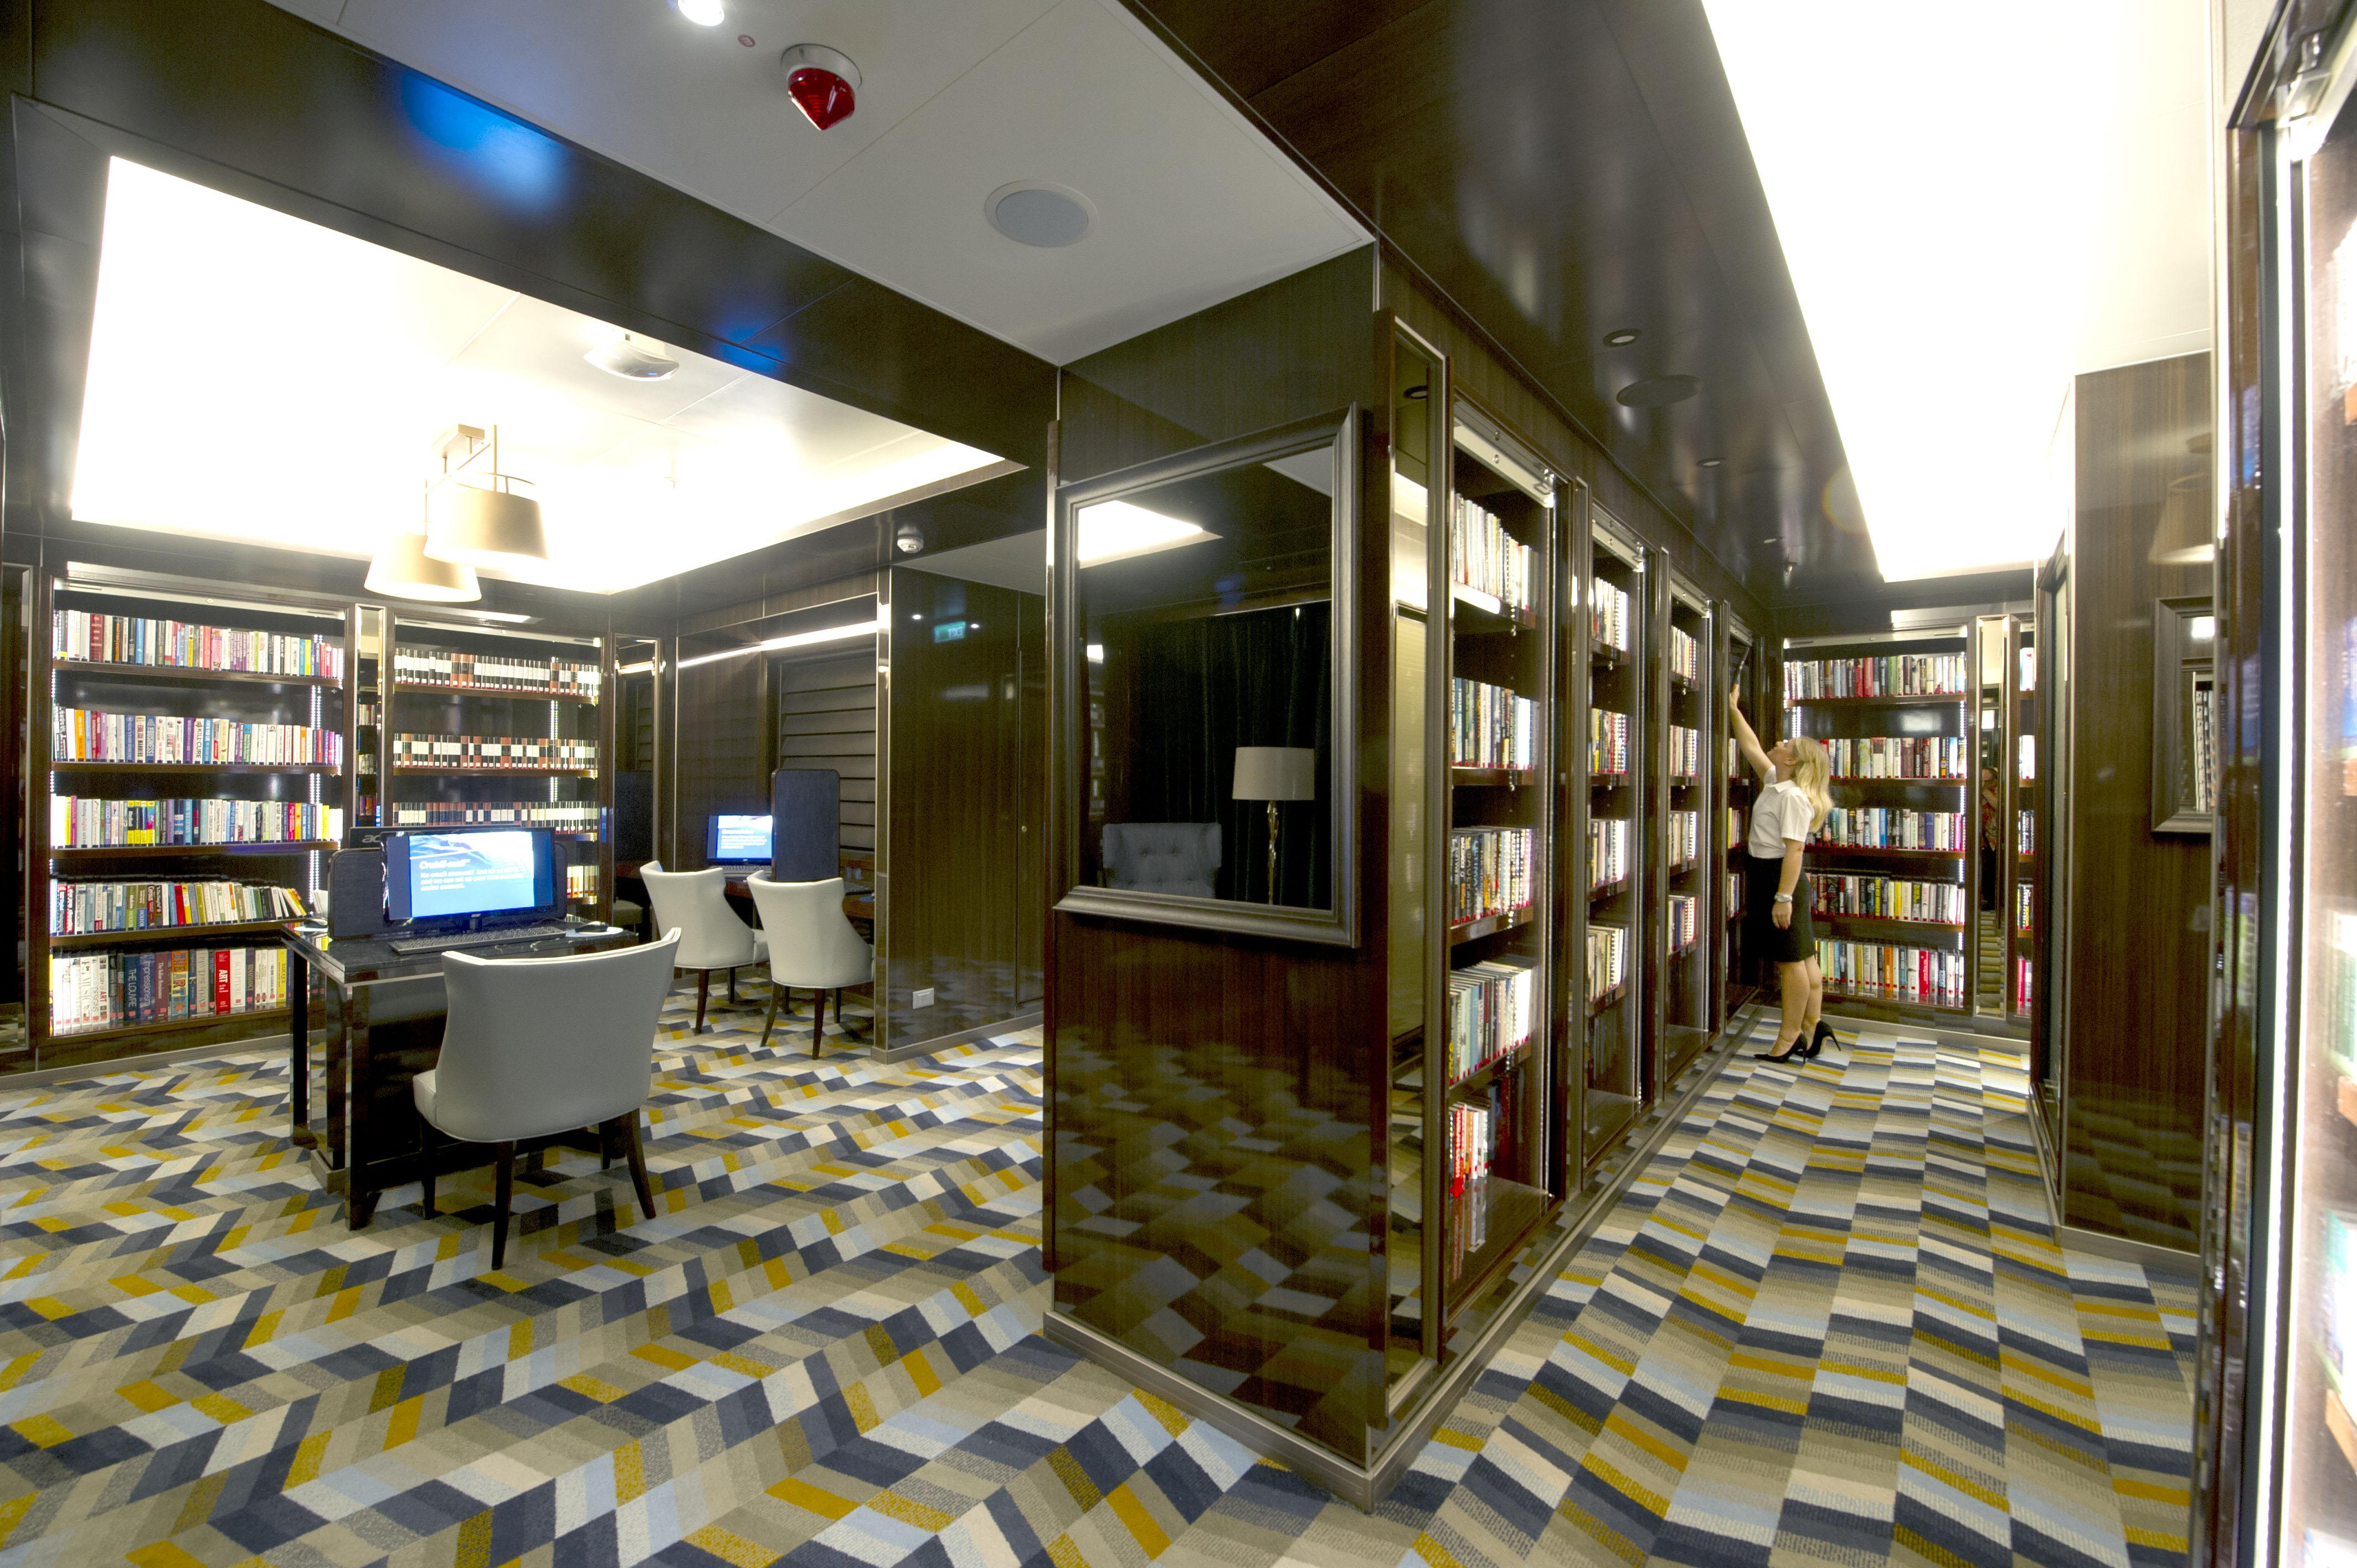 P&O Cruises Britannia Interior Library Ds38933.jpg